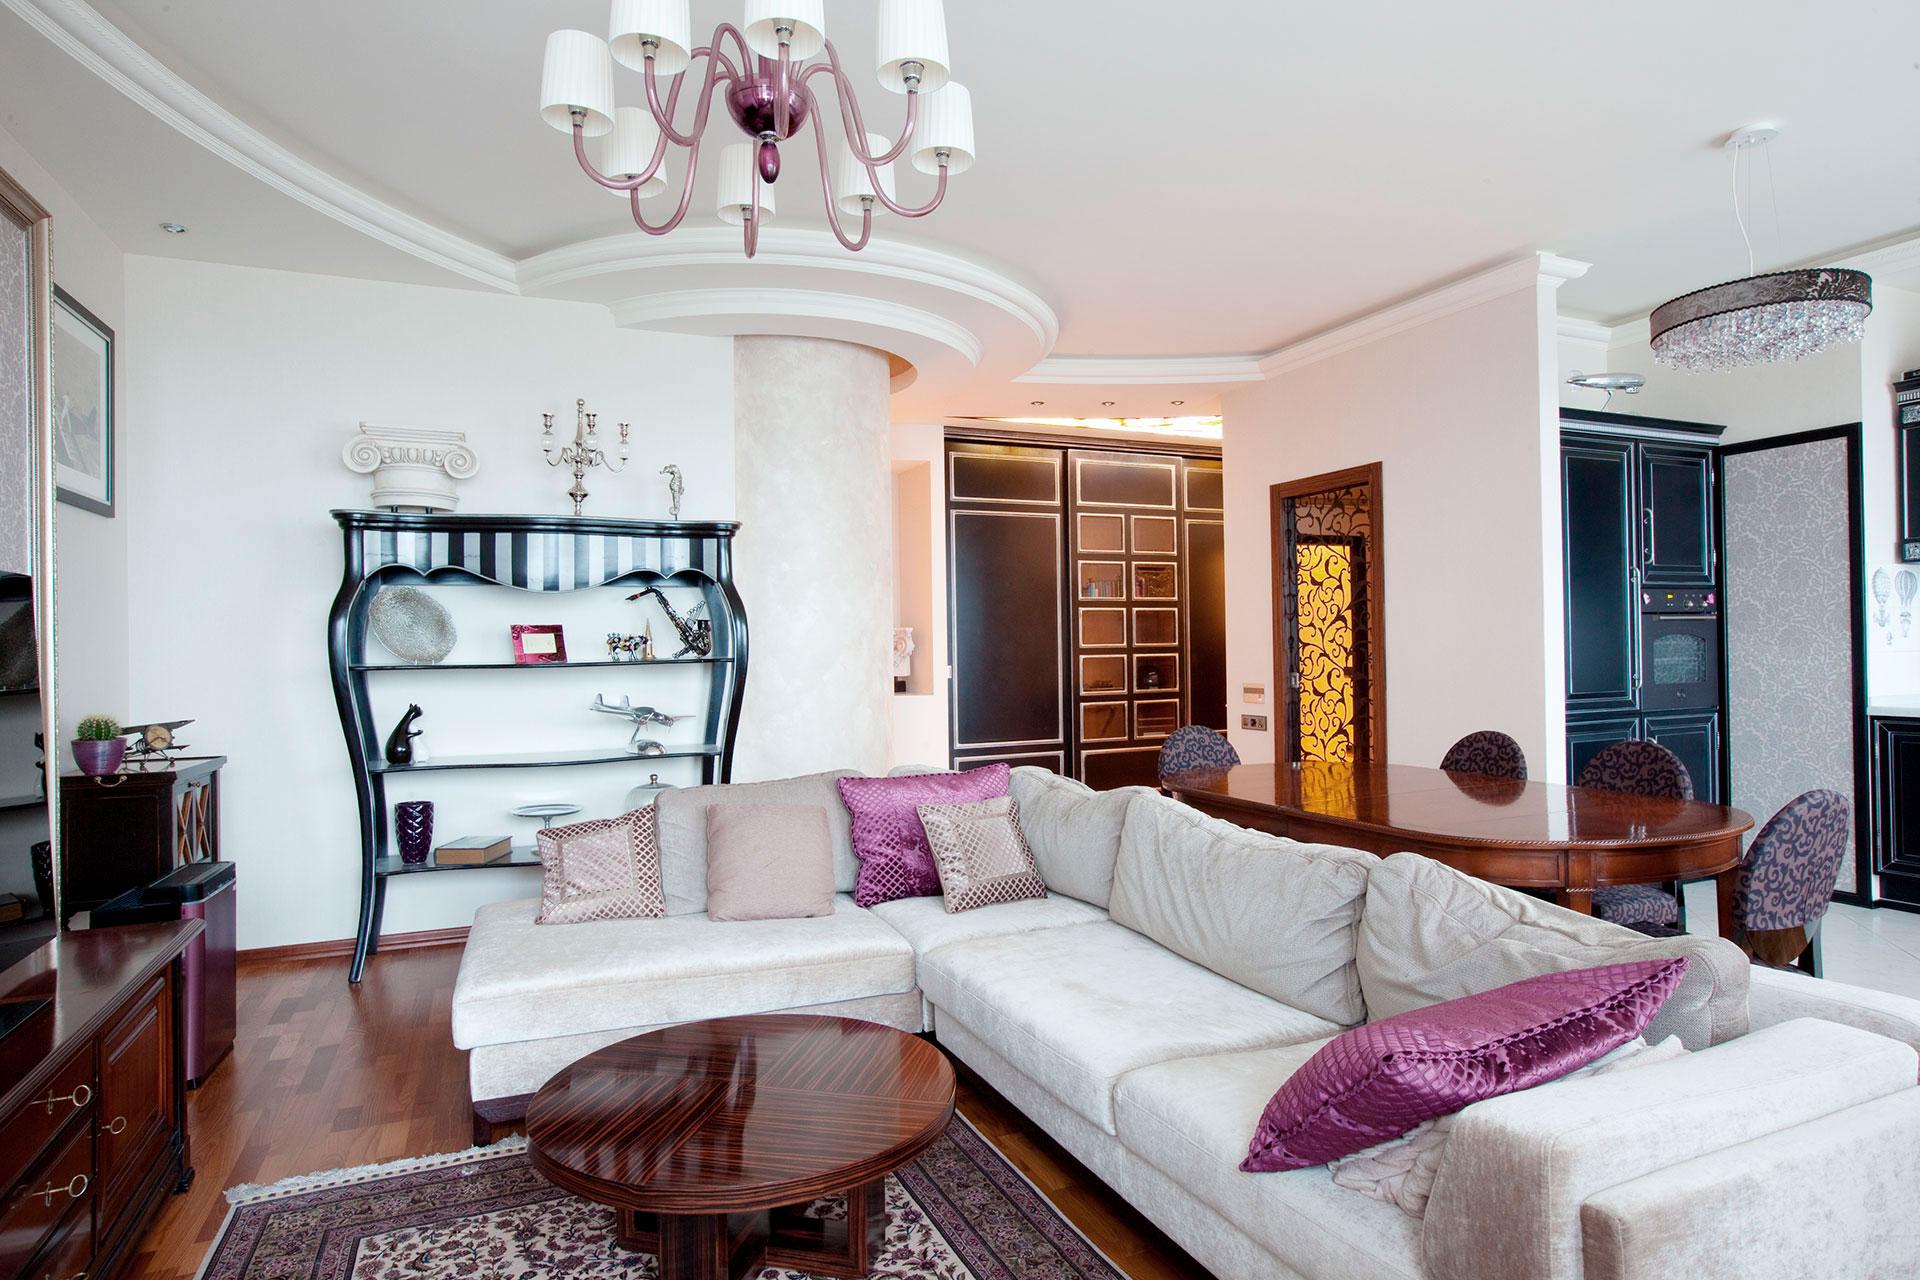 Ремонт квартиры в стиле Арт-Деко